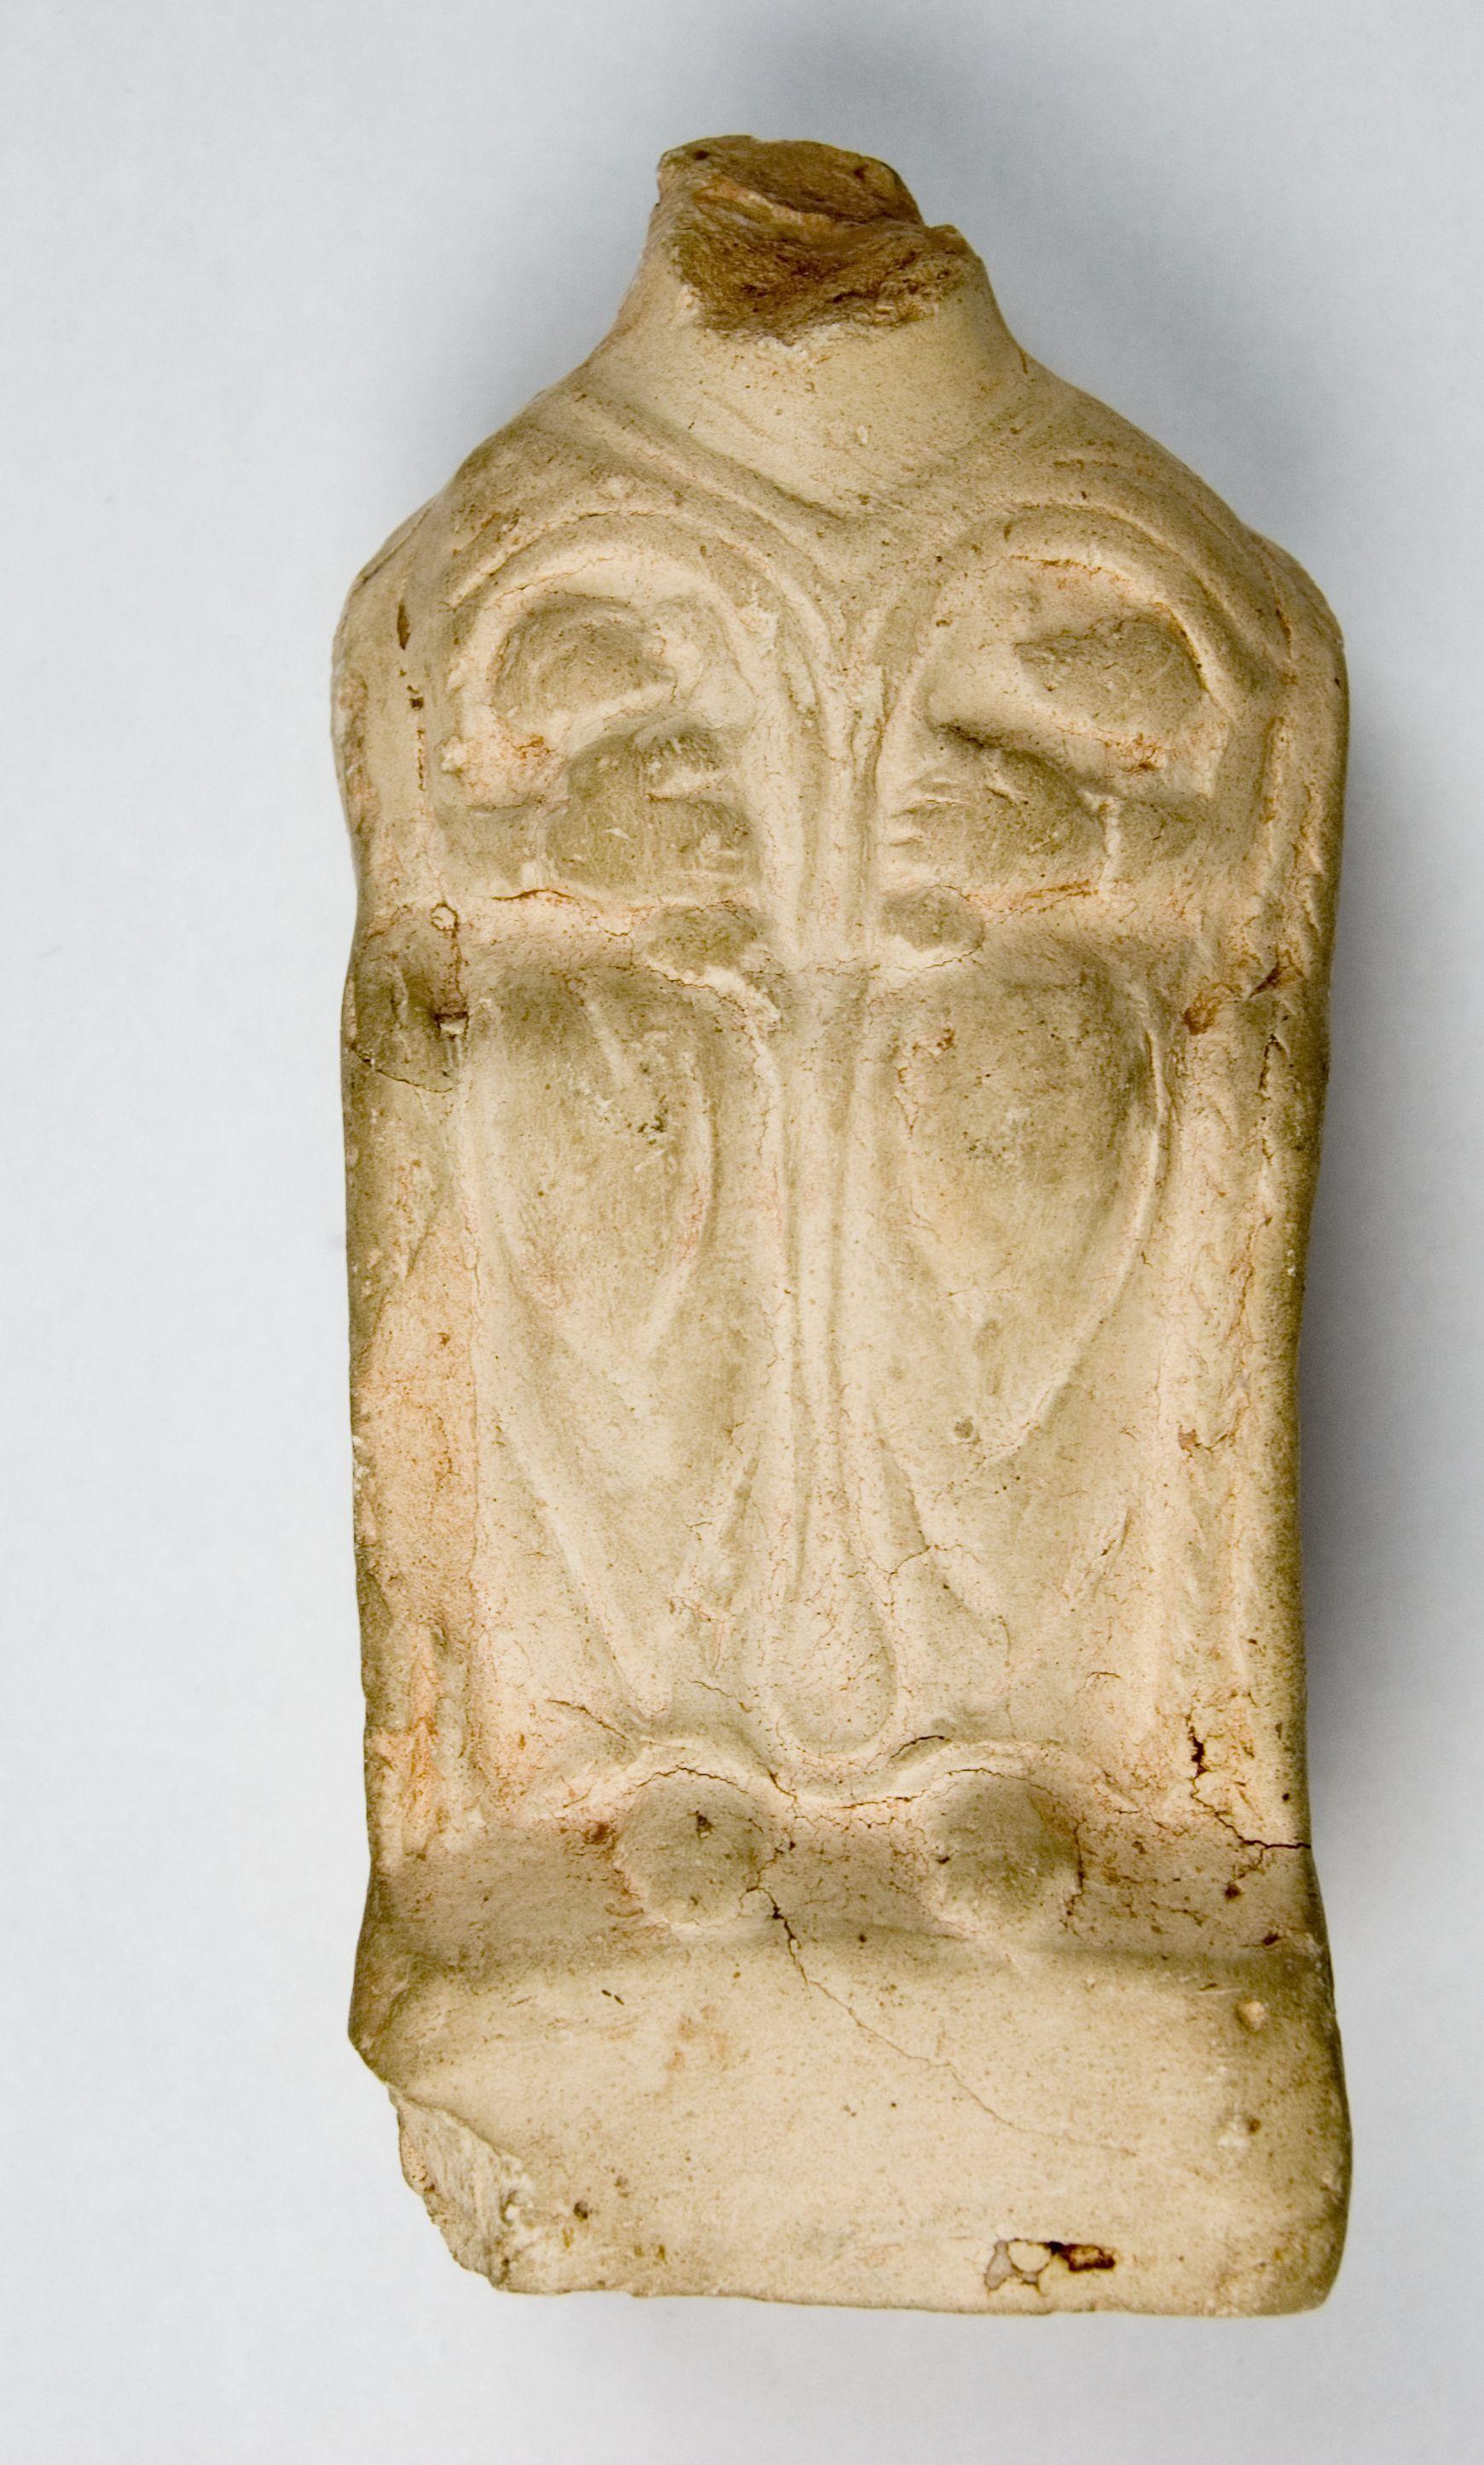 Mother goddess figurine